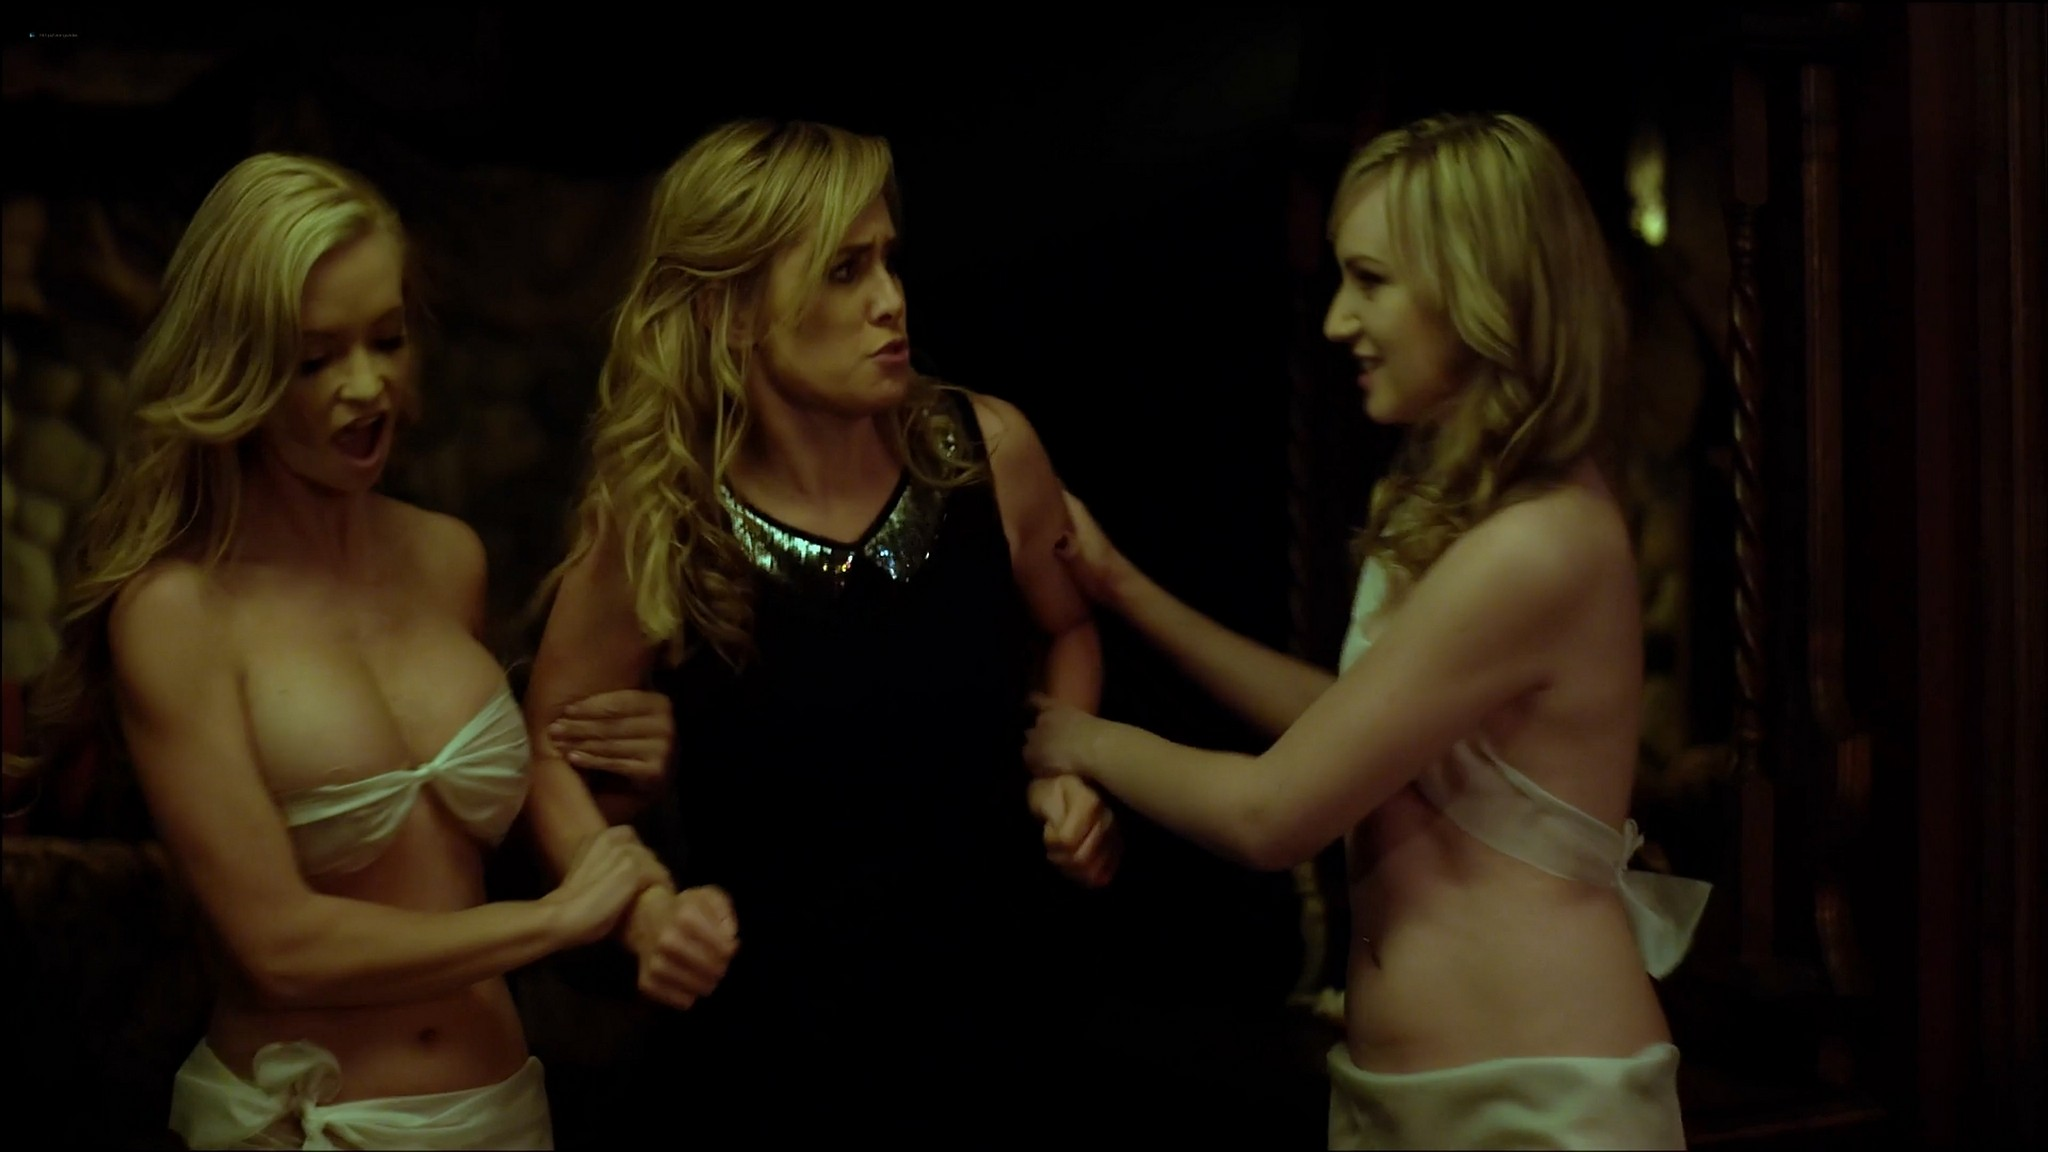 Mindy Robinson see through Christina Collard nude Dracula The Impaler 2013 1080p BluRay 11